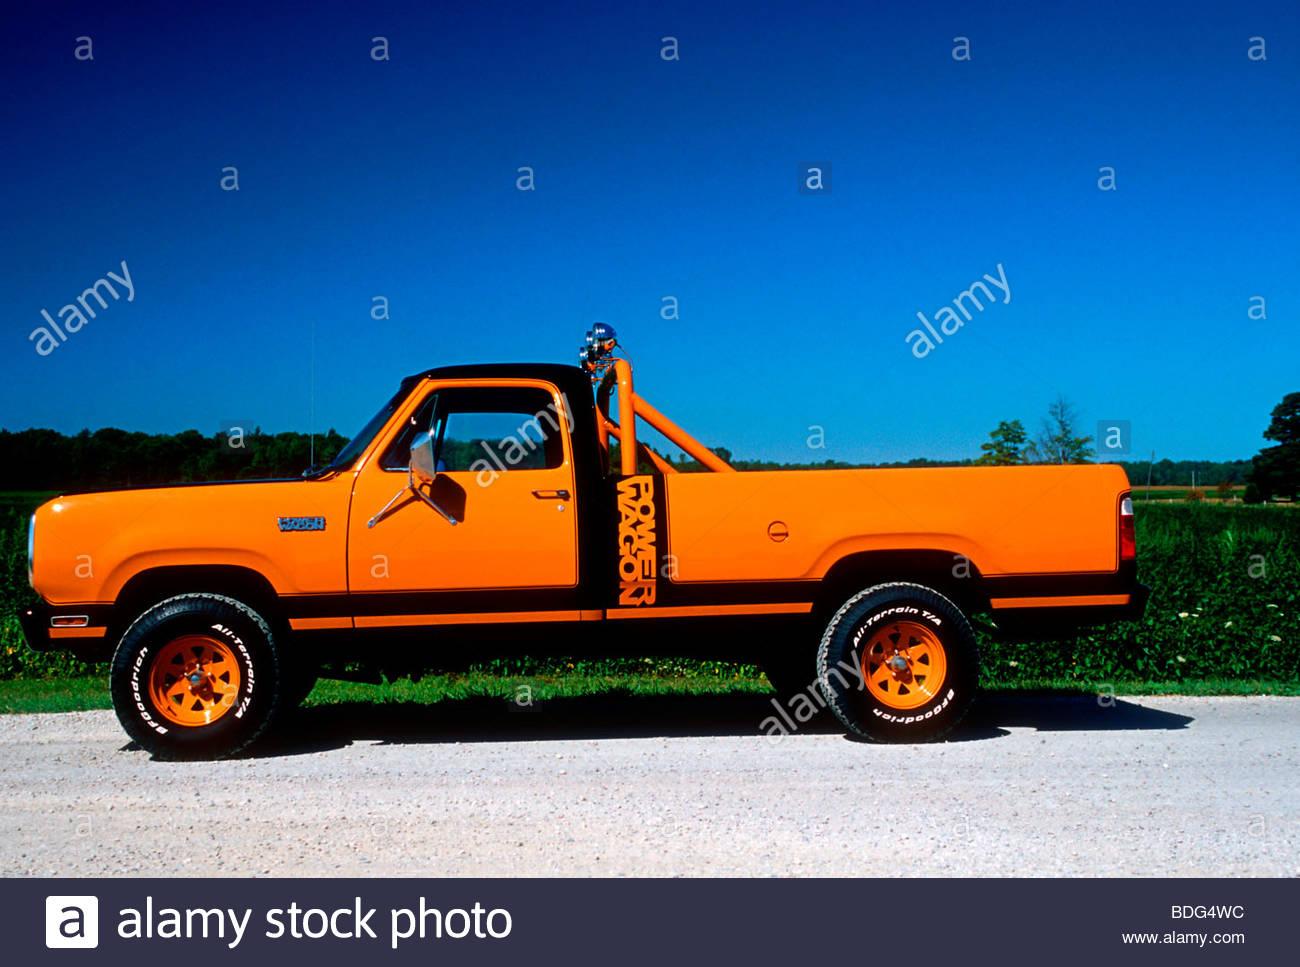 1979-dodge-macho-power-wagon-BDG4WC.jpg